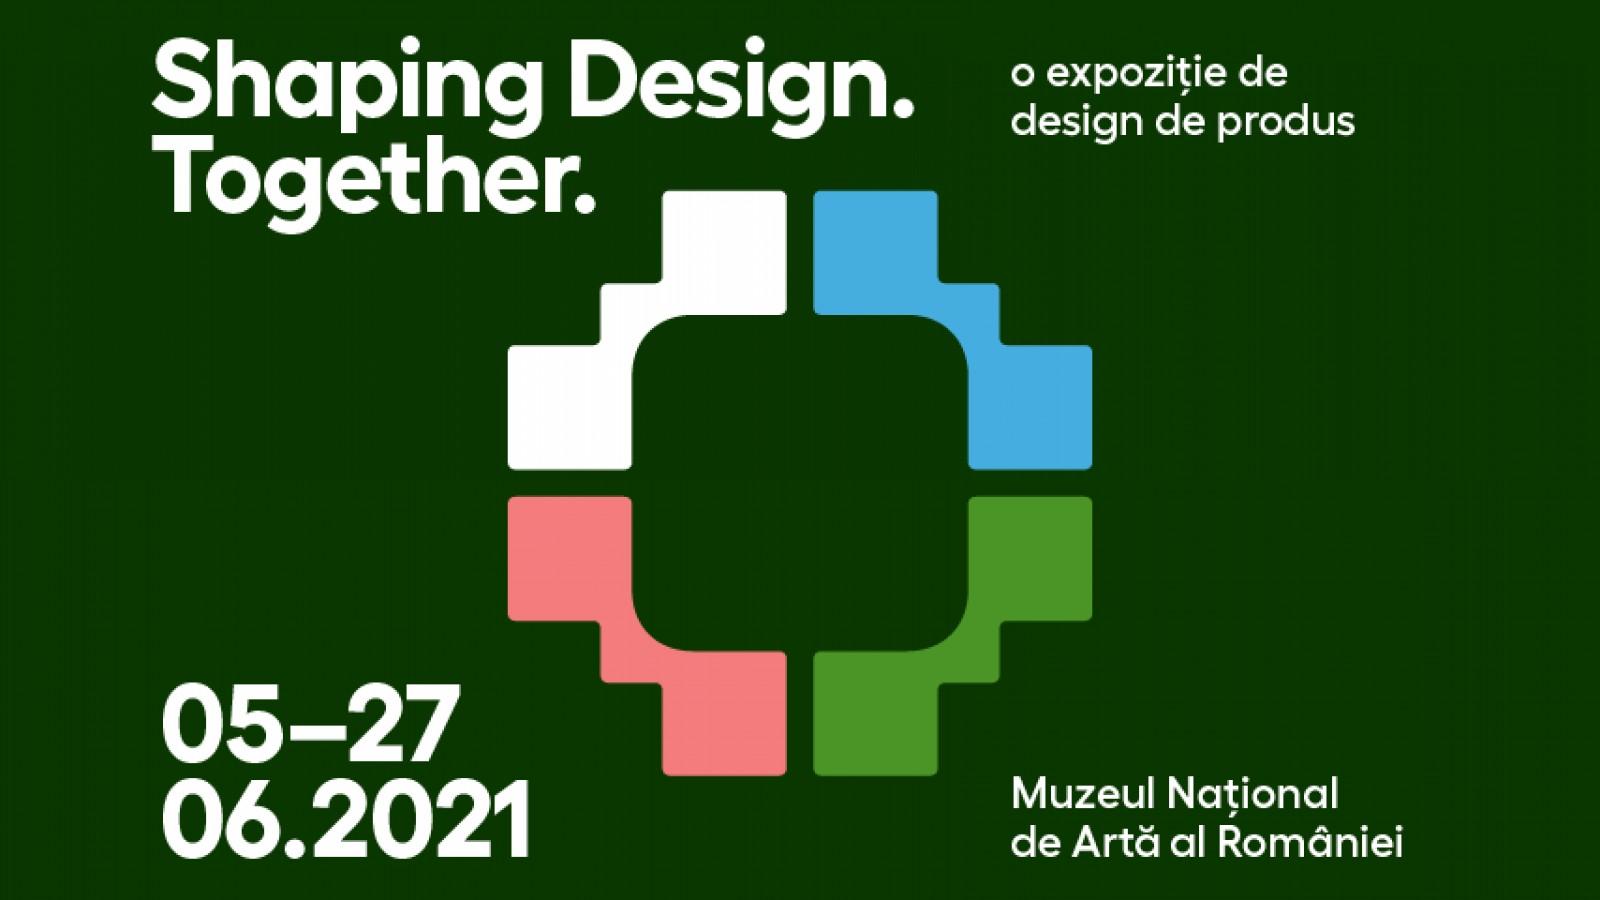 Shaping Design. Together. Expoziție de design de produs